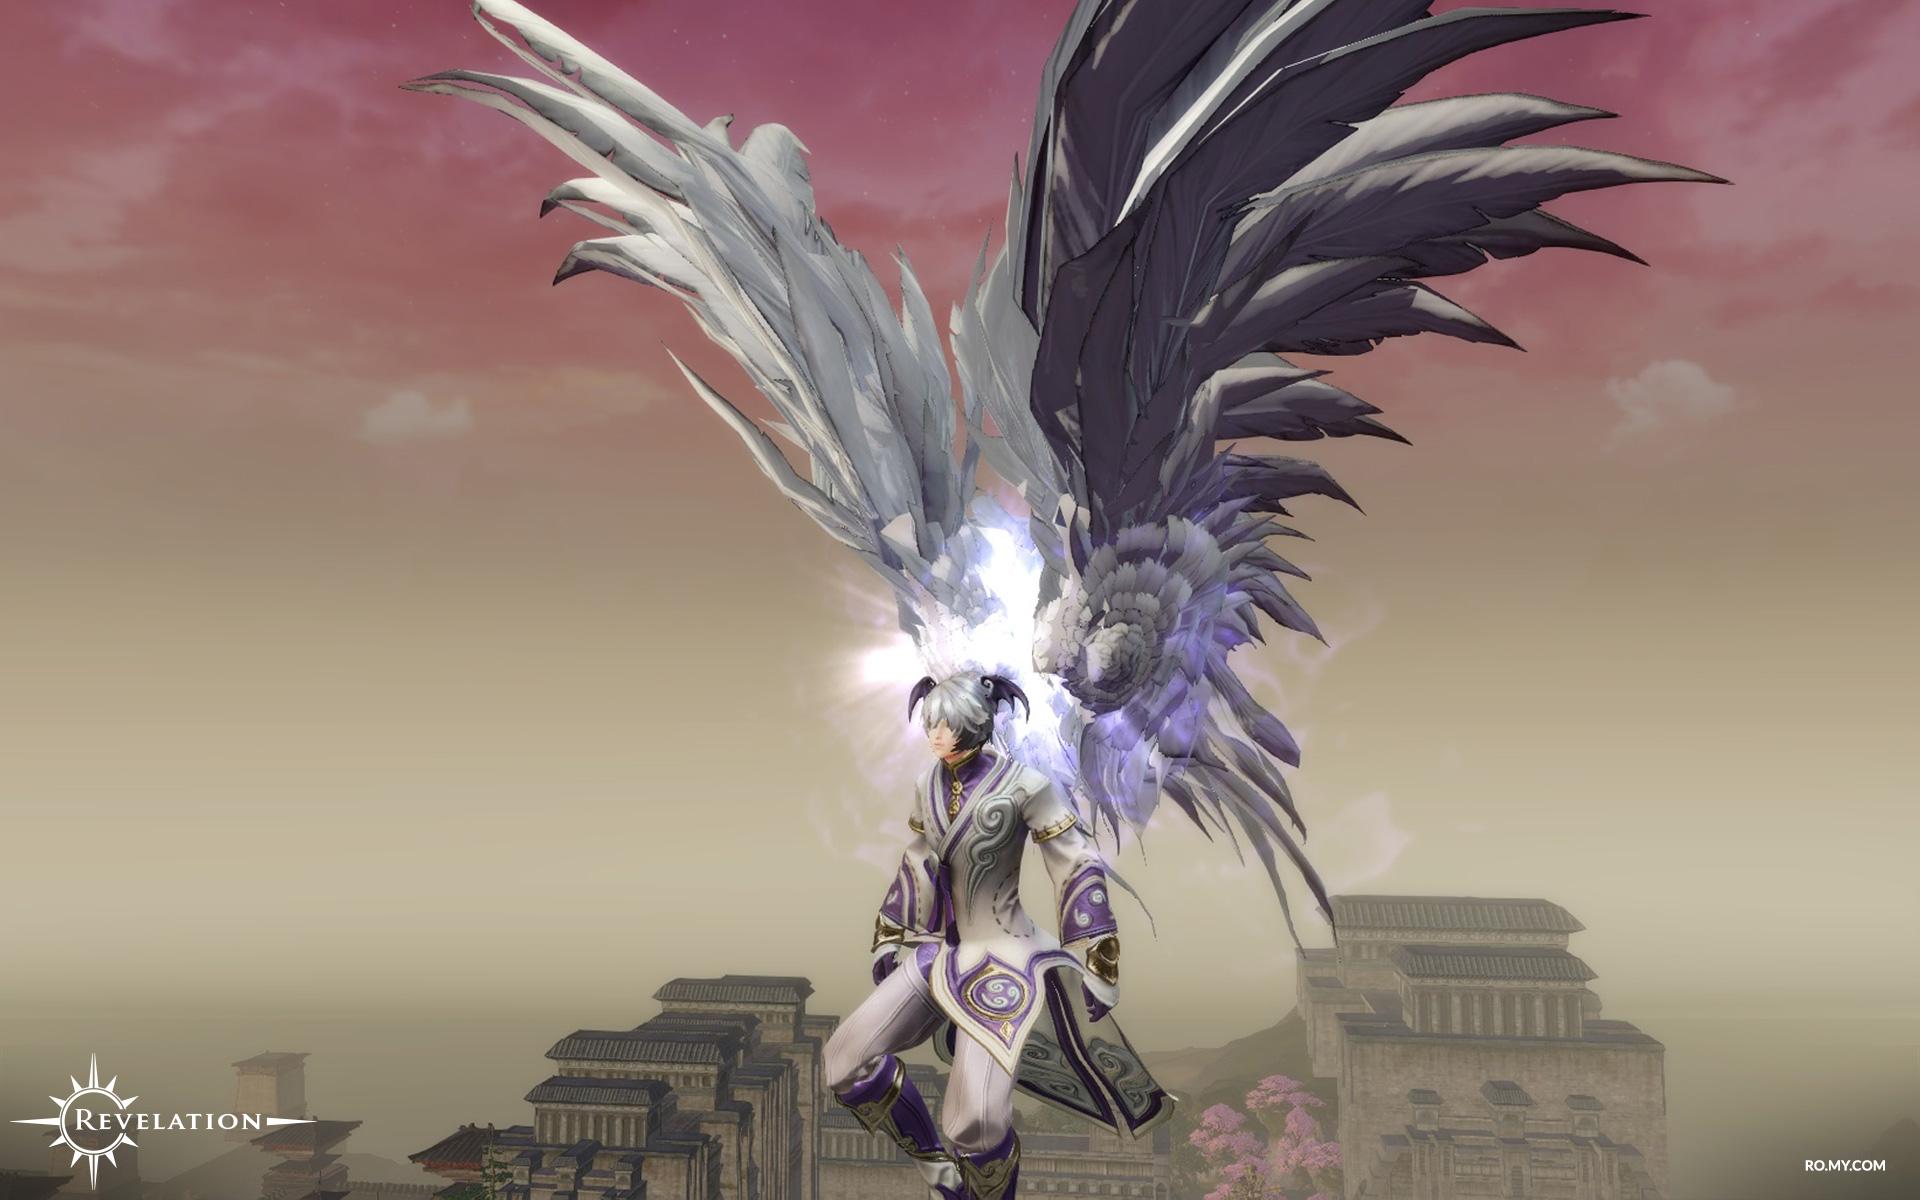 Revelation Online: Flügel-Guide – Besondere Flügel finden